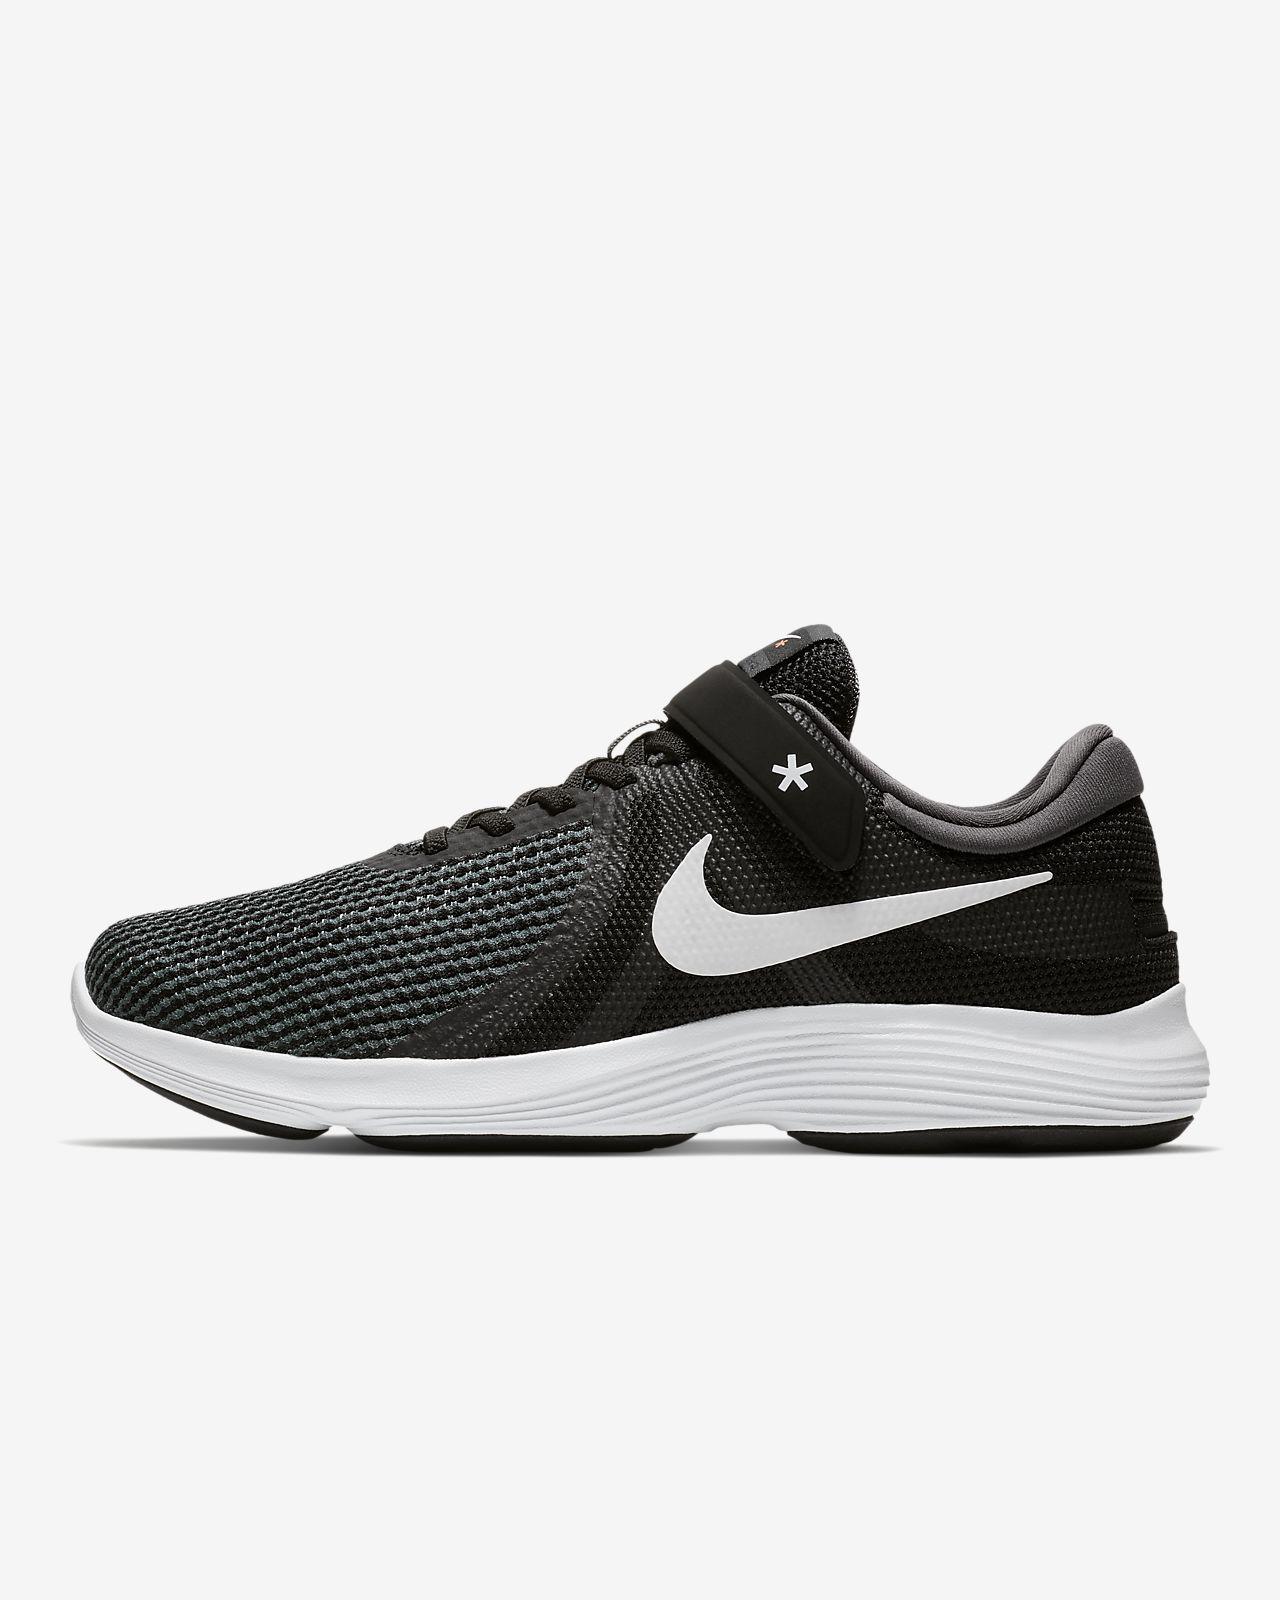 e9b36099c9de Nike Revolution 4 FlyEase (Extra-Wide) Men s Running Shoe. Nike.com